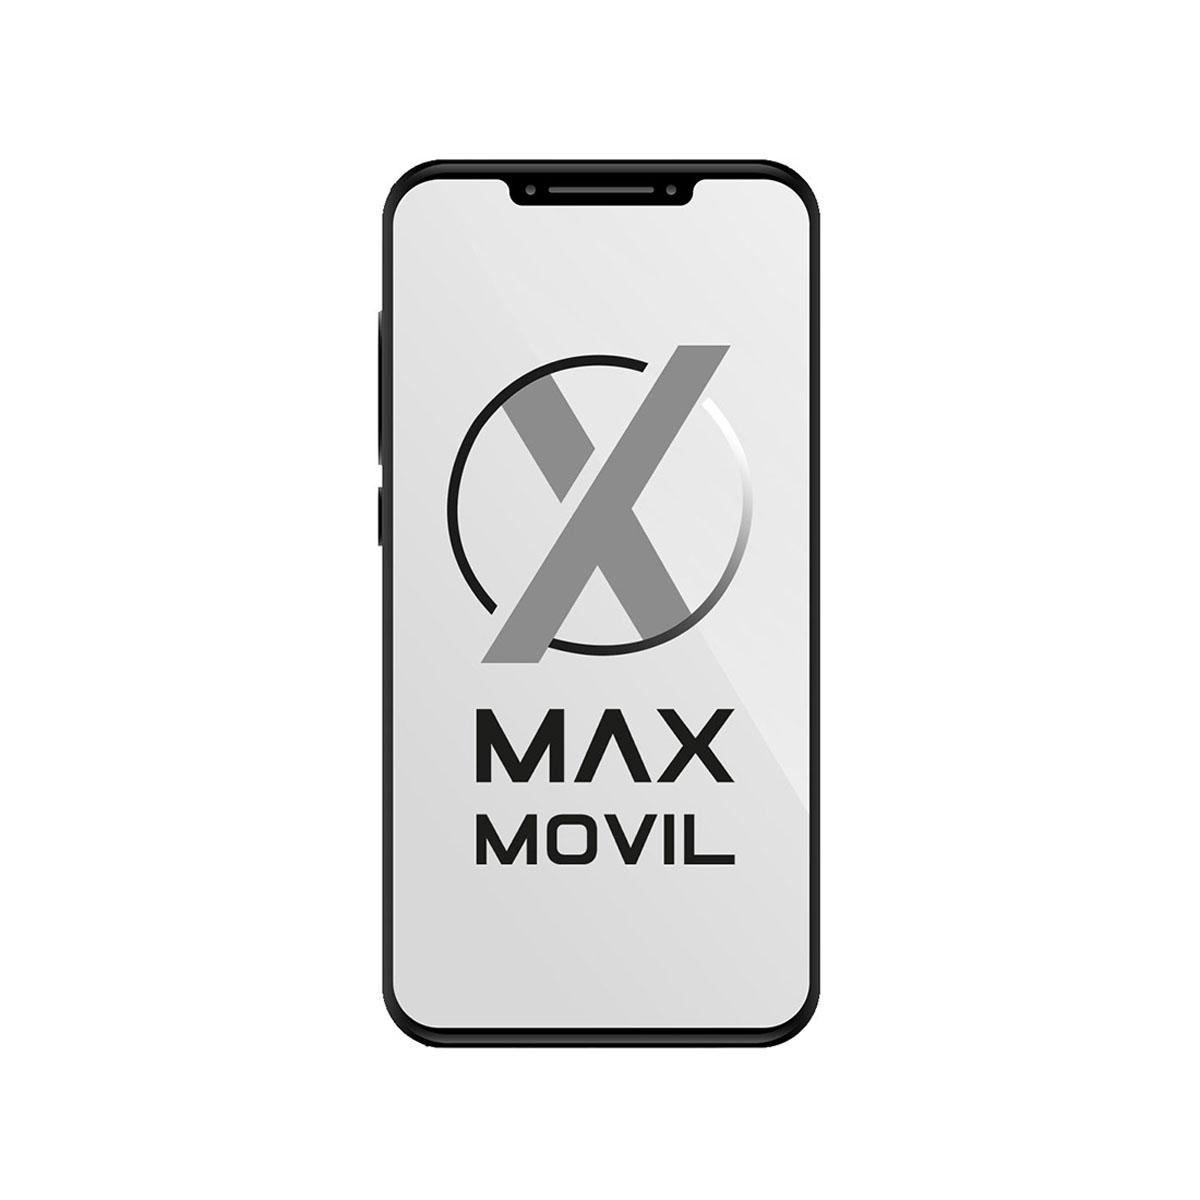 "Funda Smart Cover para iPad Pro 10,5"" Gris MQ082ZM/A"